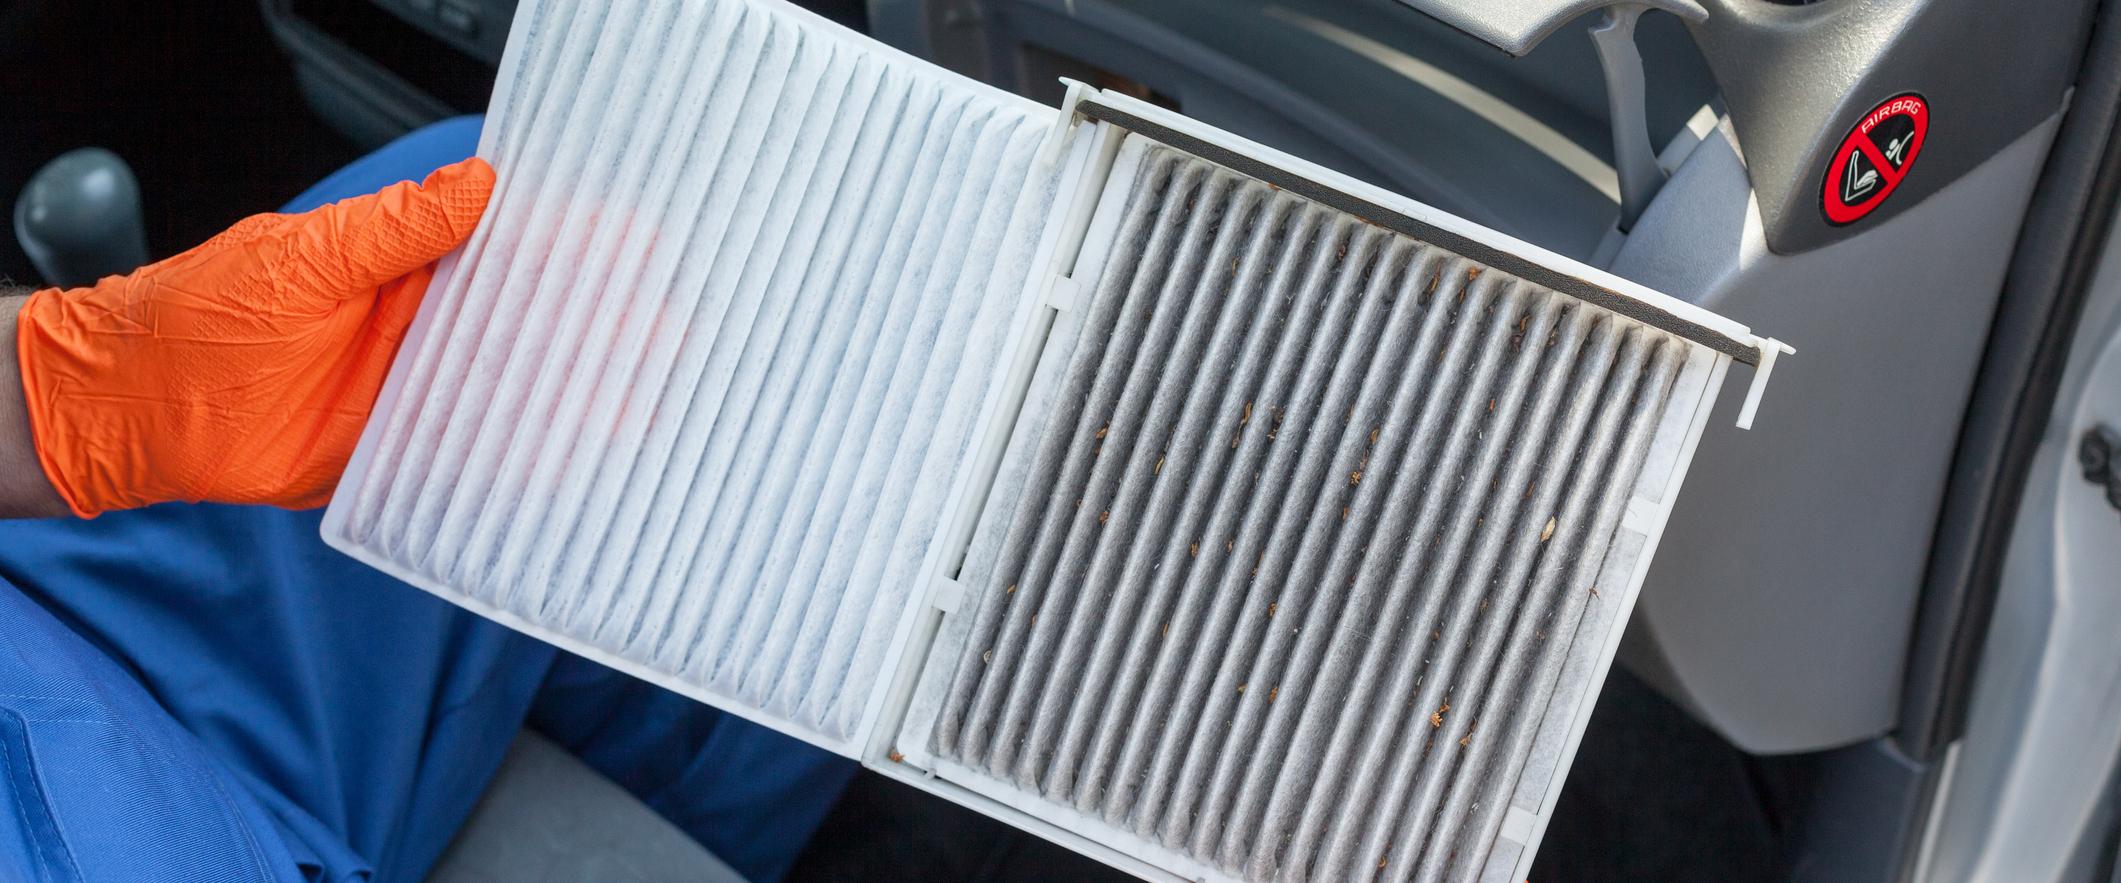 Cabin Air Filter Replacement Service near Schererville, IN